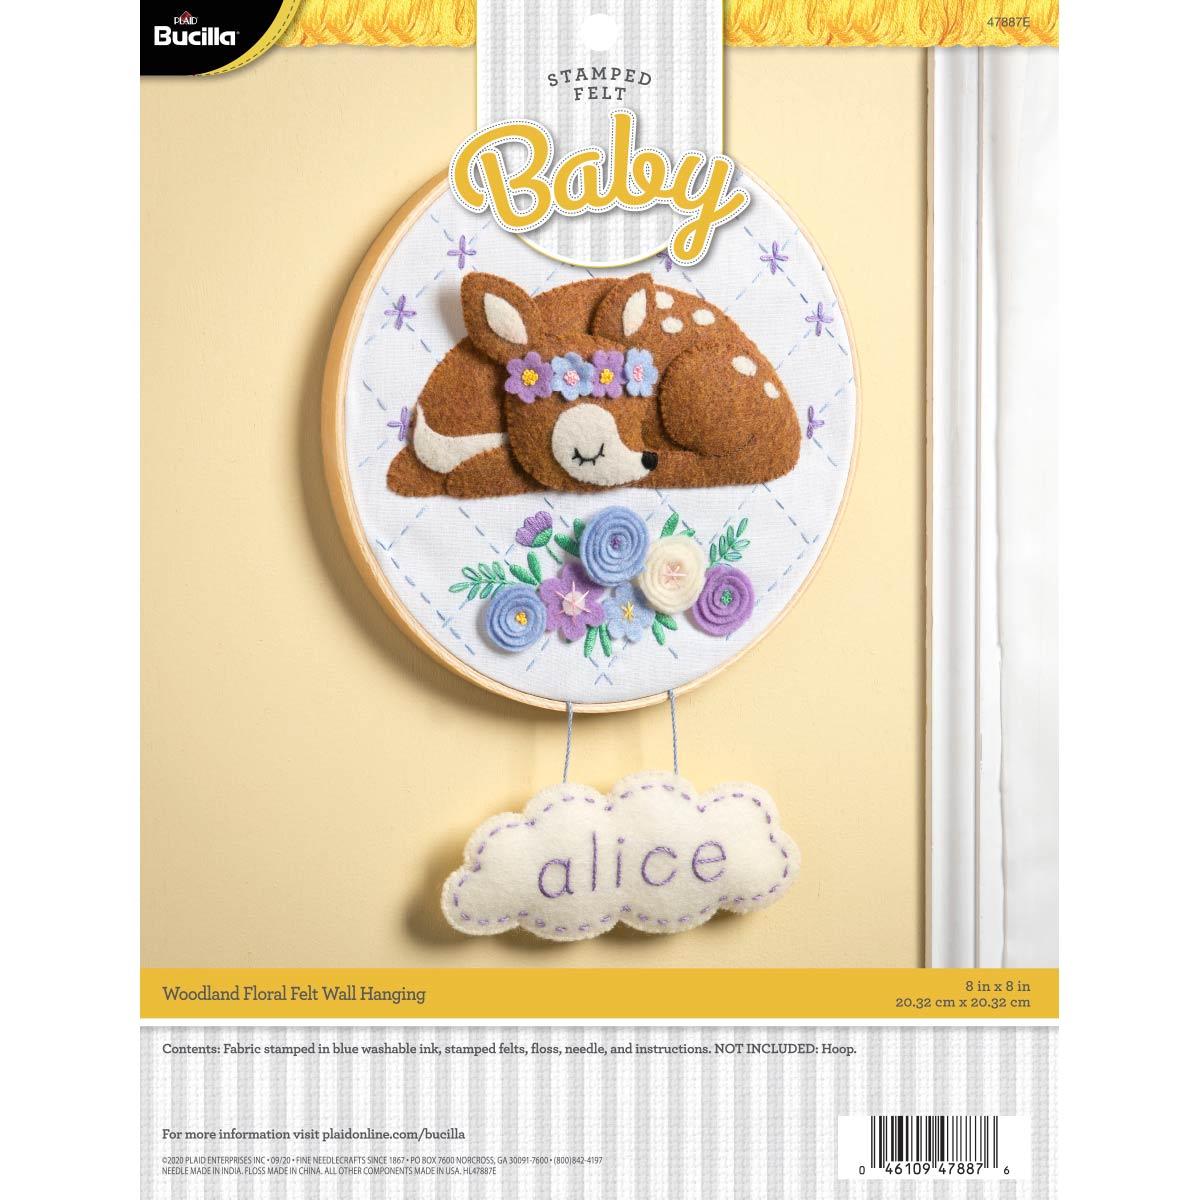 Bucilla ® Baby - Felt - Crib Ensembles - Woodland Floral - Wall Hanging - 47887E